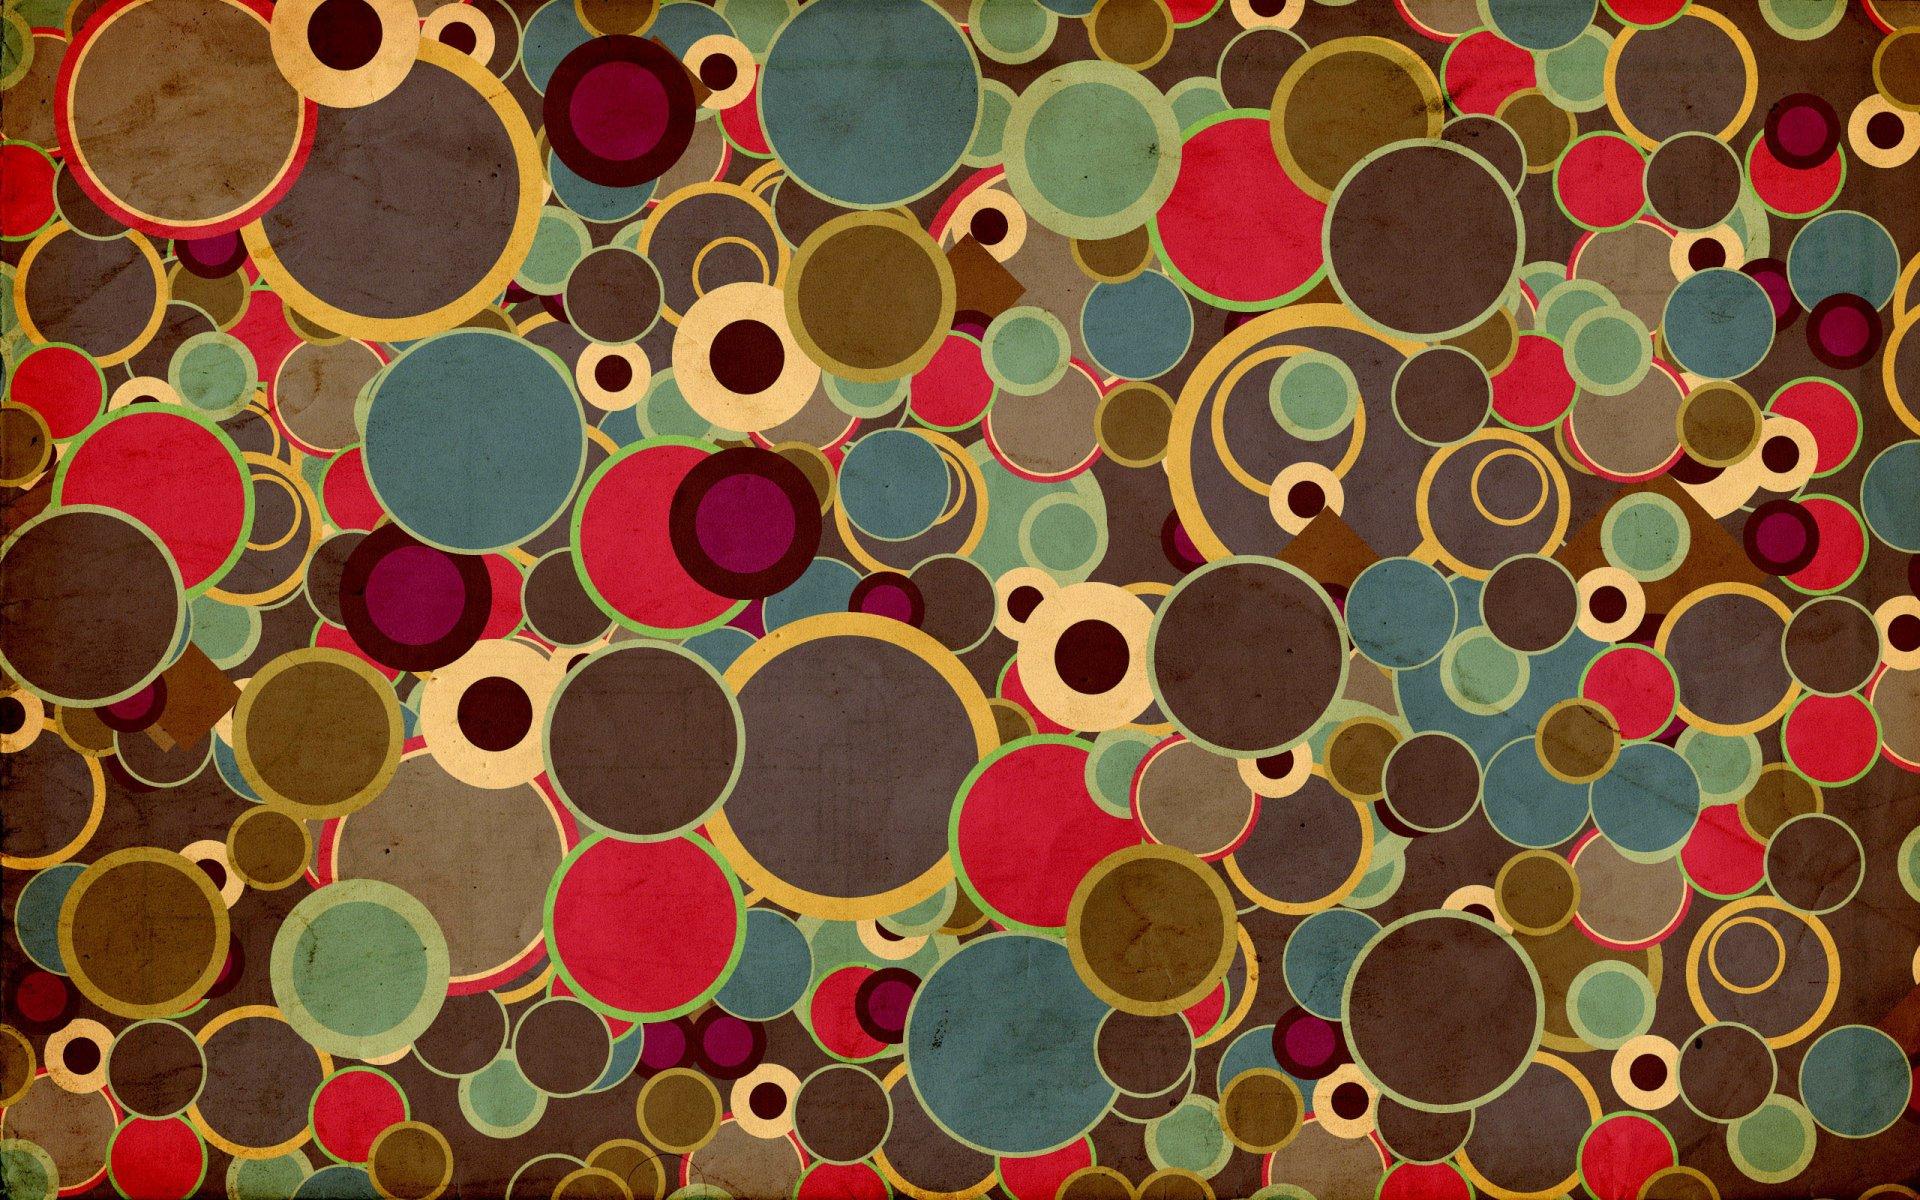 Картинки абстракции круги